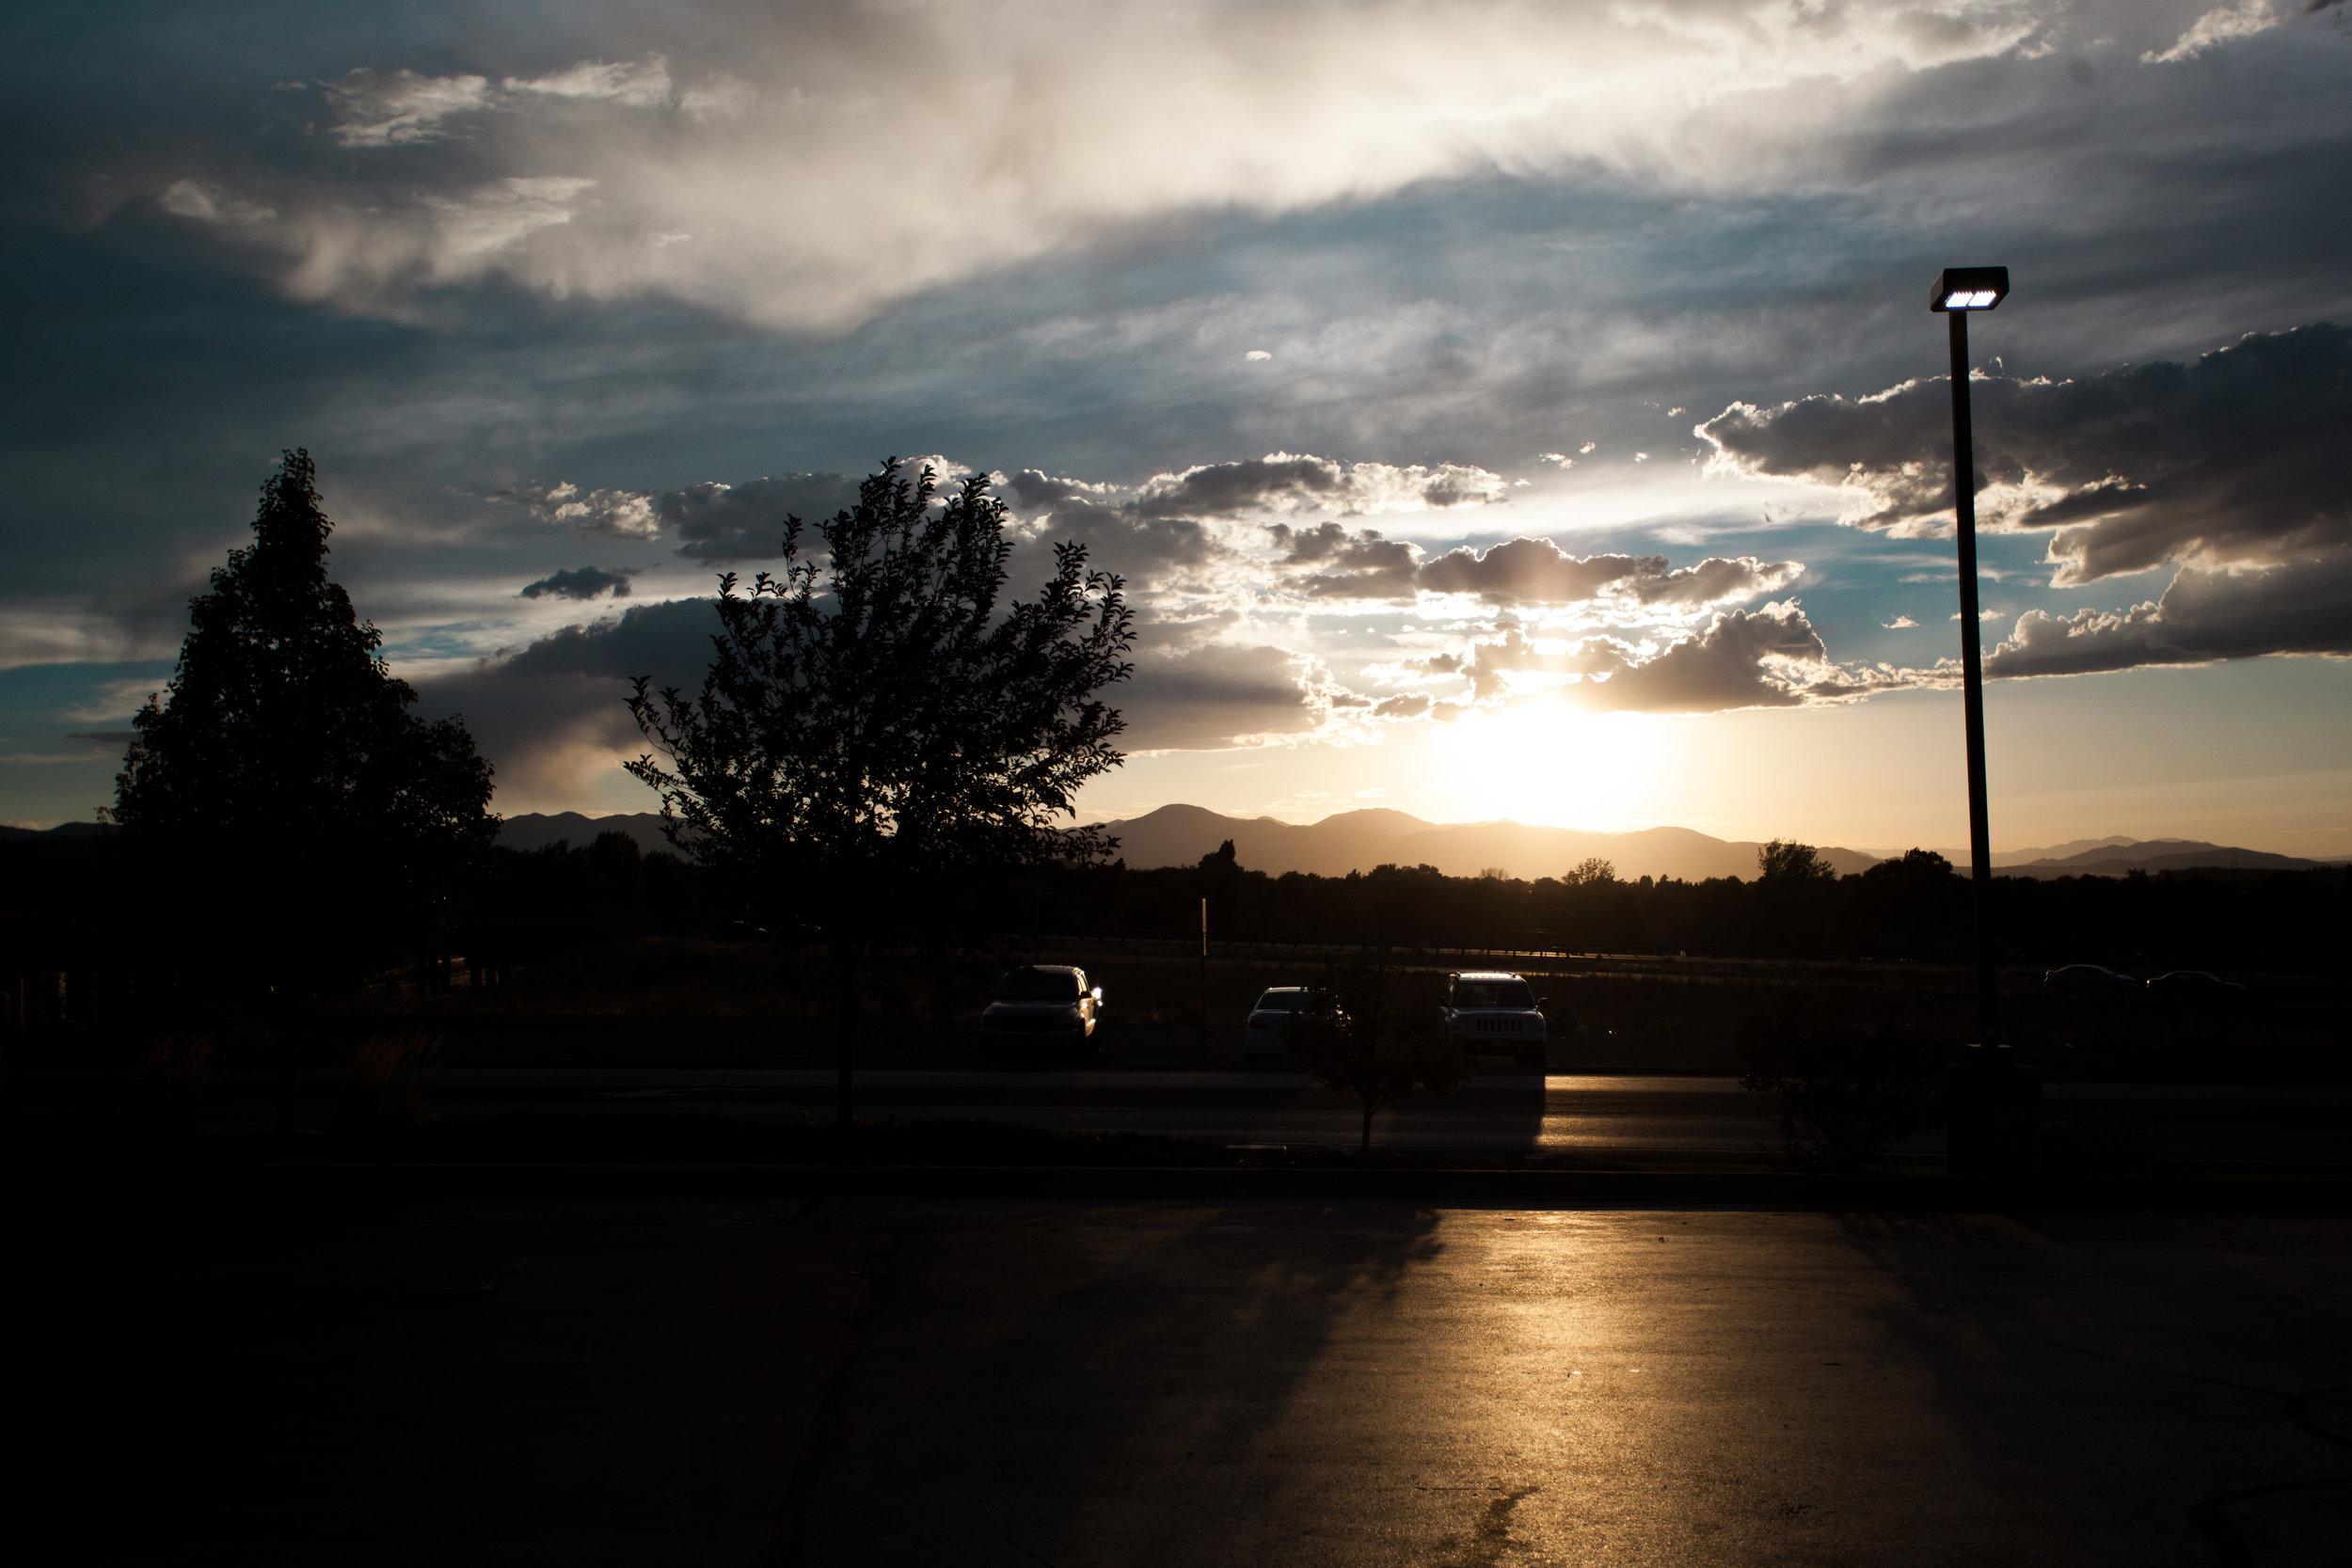 Chacon Images_RoadtripUSA_pt2_Print_-1415.jpg